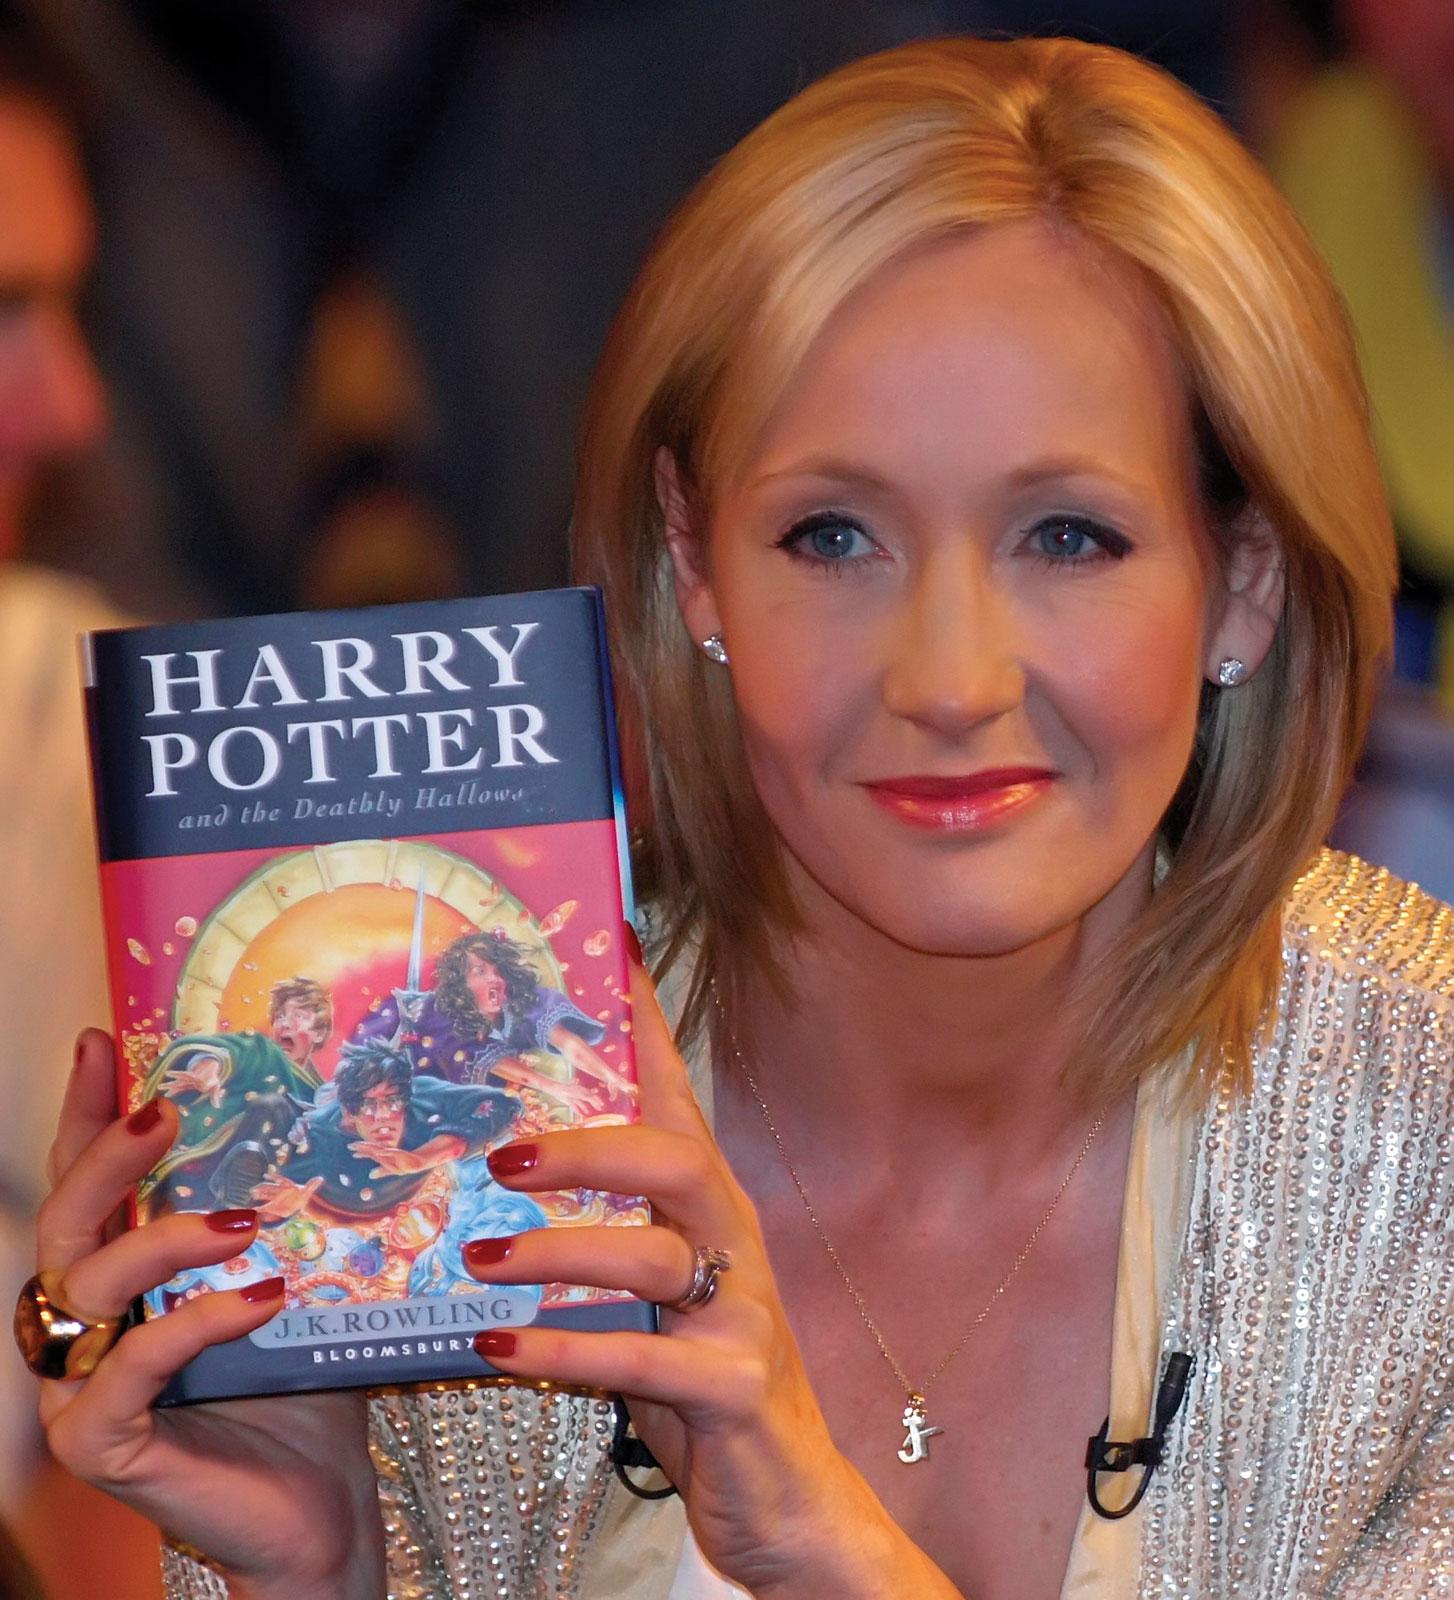 jk rowling source - Joanne K Rowling Lebenslauf